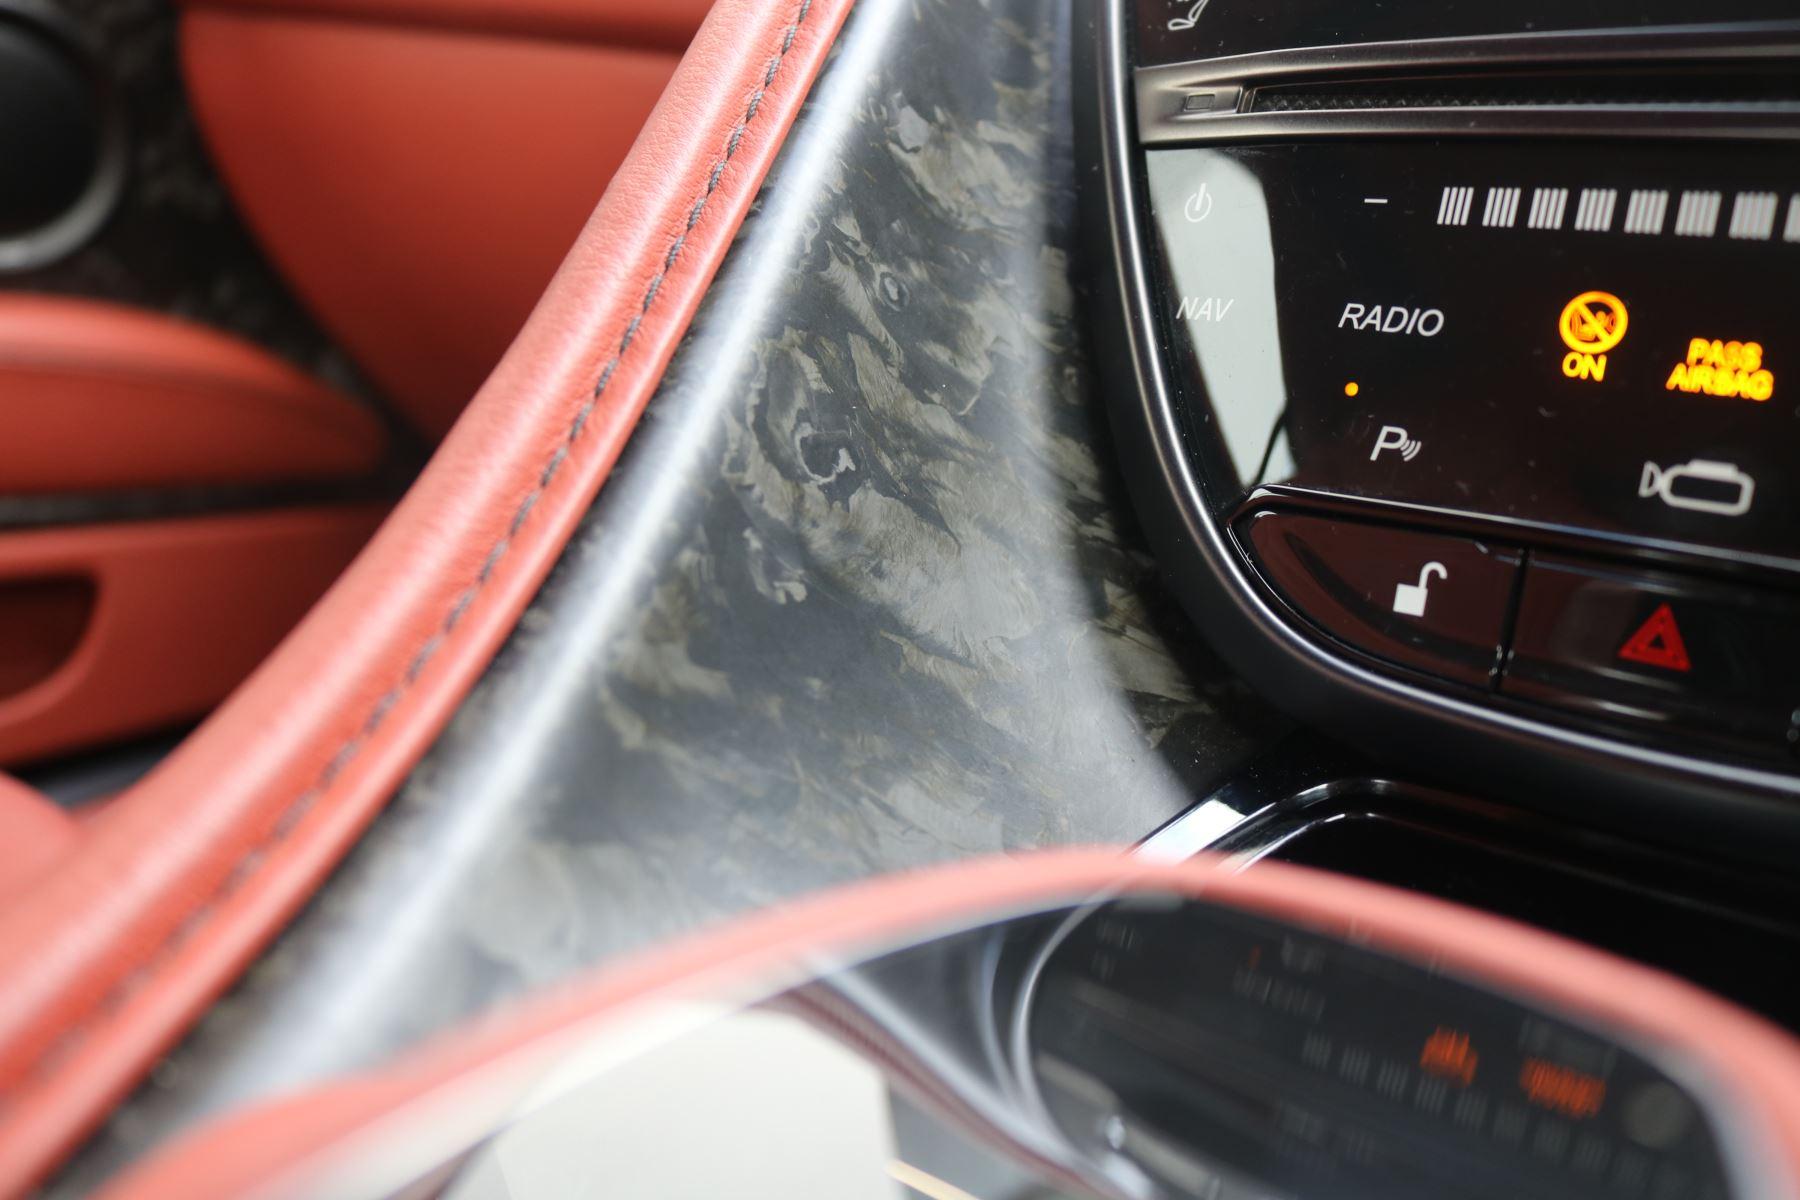 Aston Martin DBS V12 Superleggera 2dr Touchtronic image 28